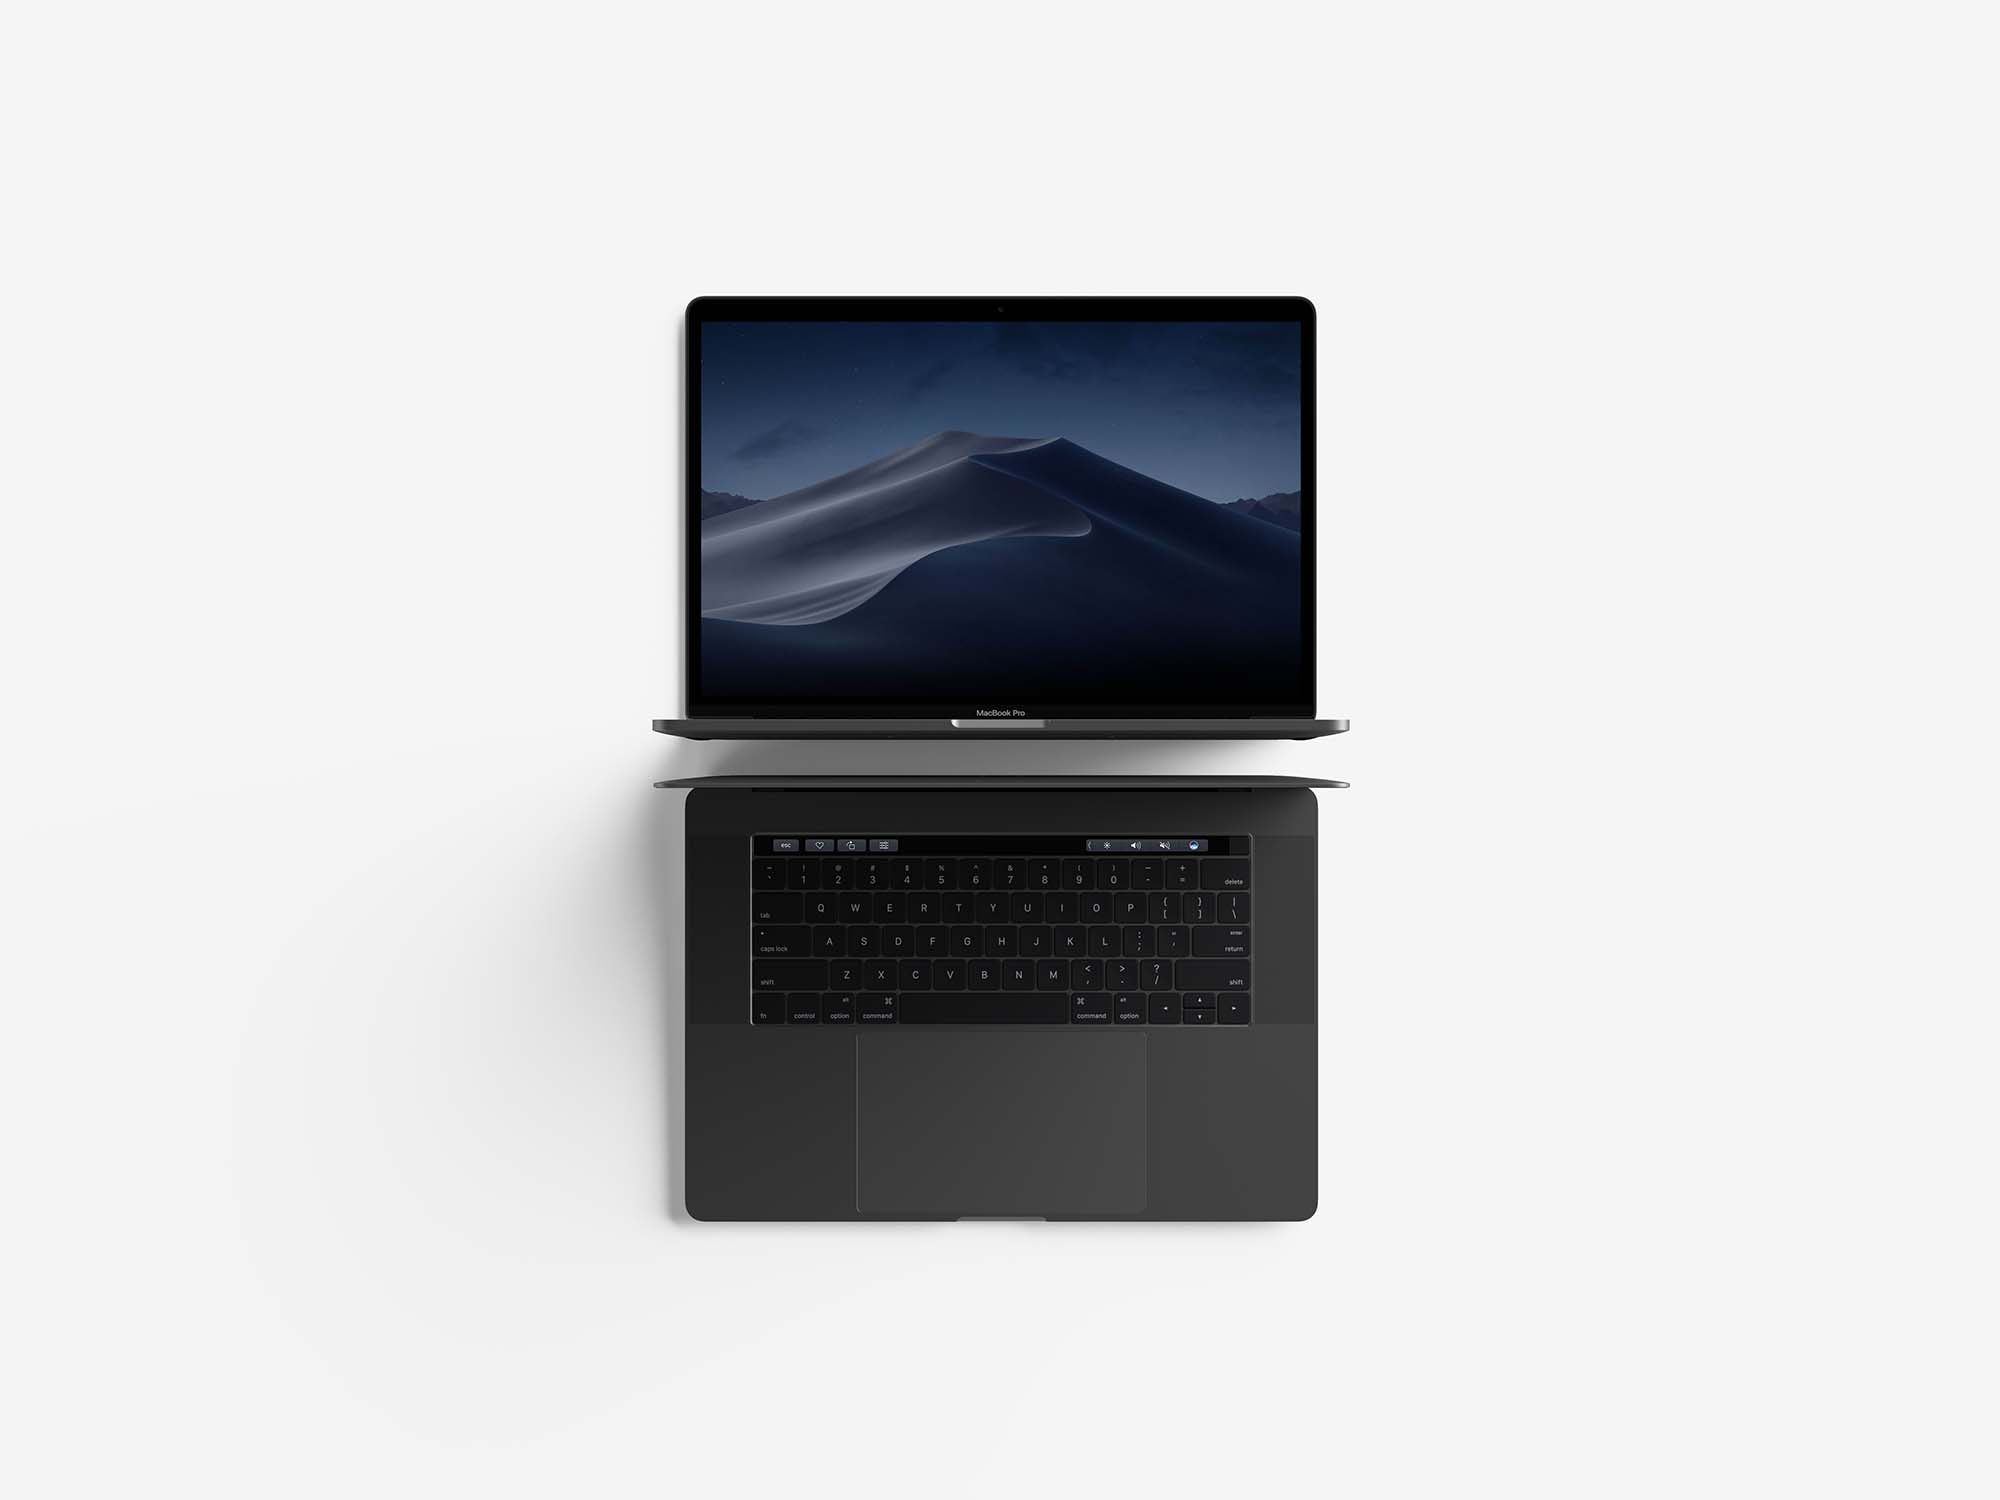 Macbook Laptop Mockup